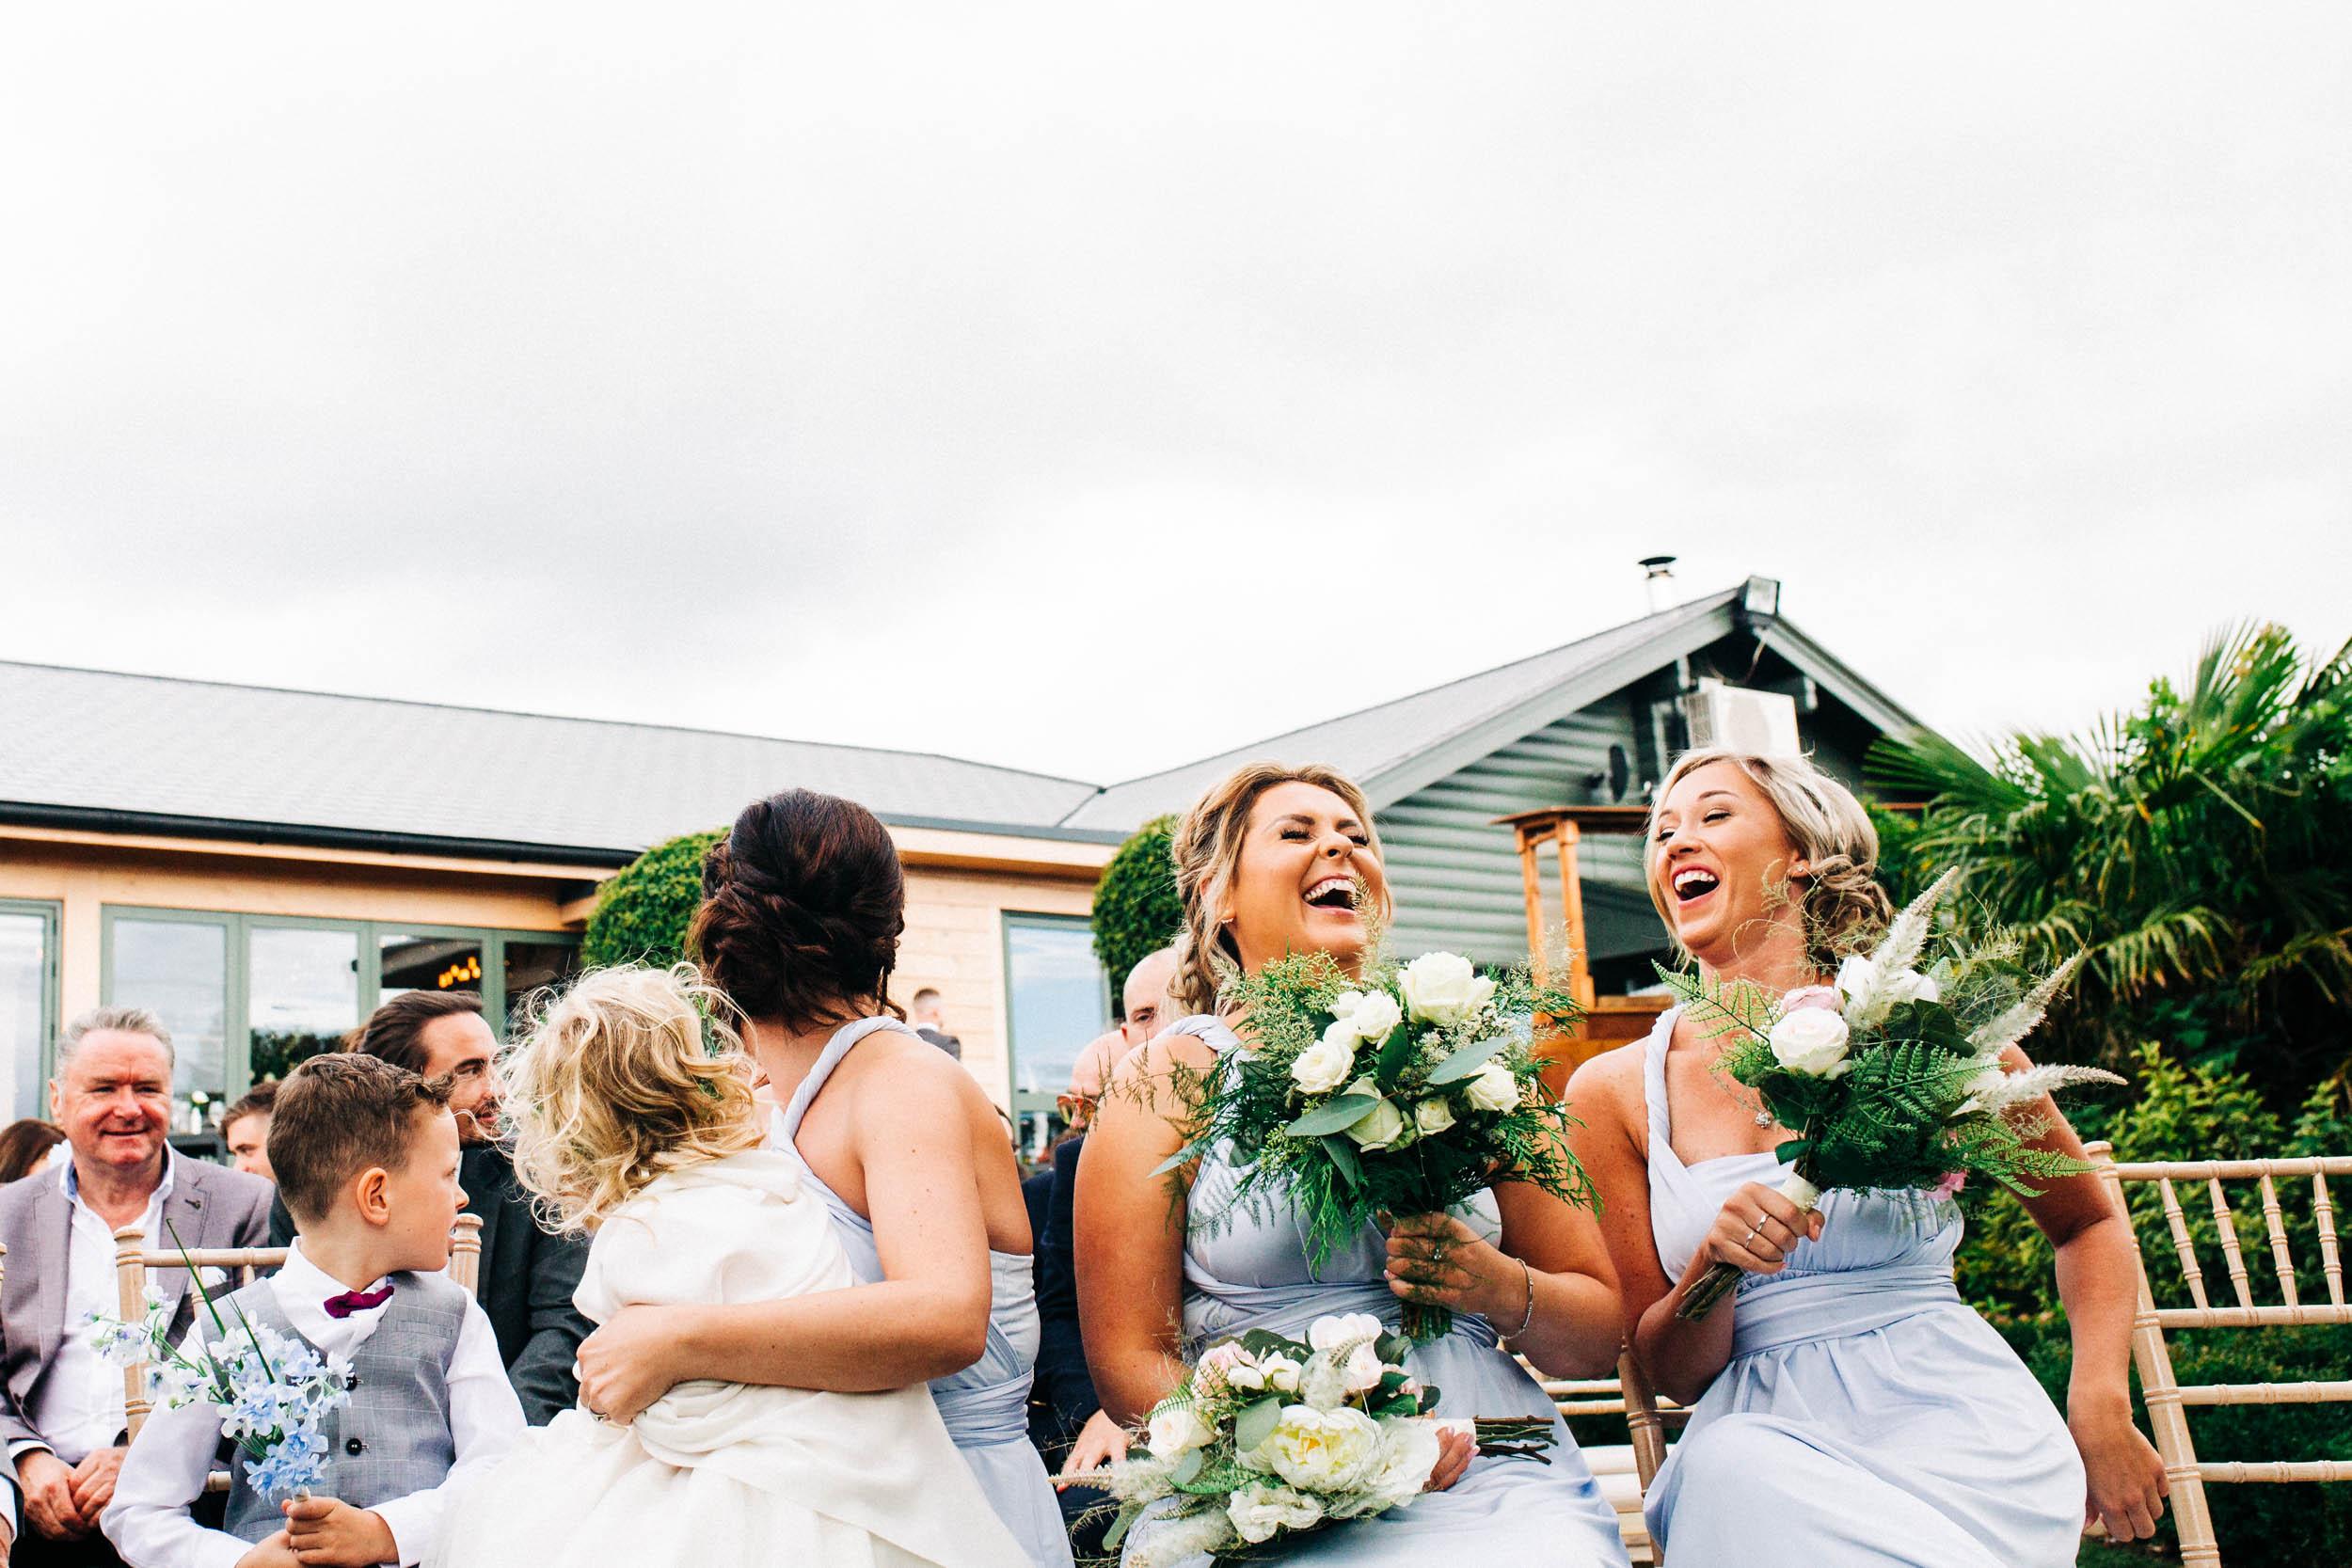 Alex_Sedgmond_Photography-SouthWalesWeddingPhotography-Wedding-Photographer-Cardiff-221.jpg